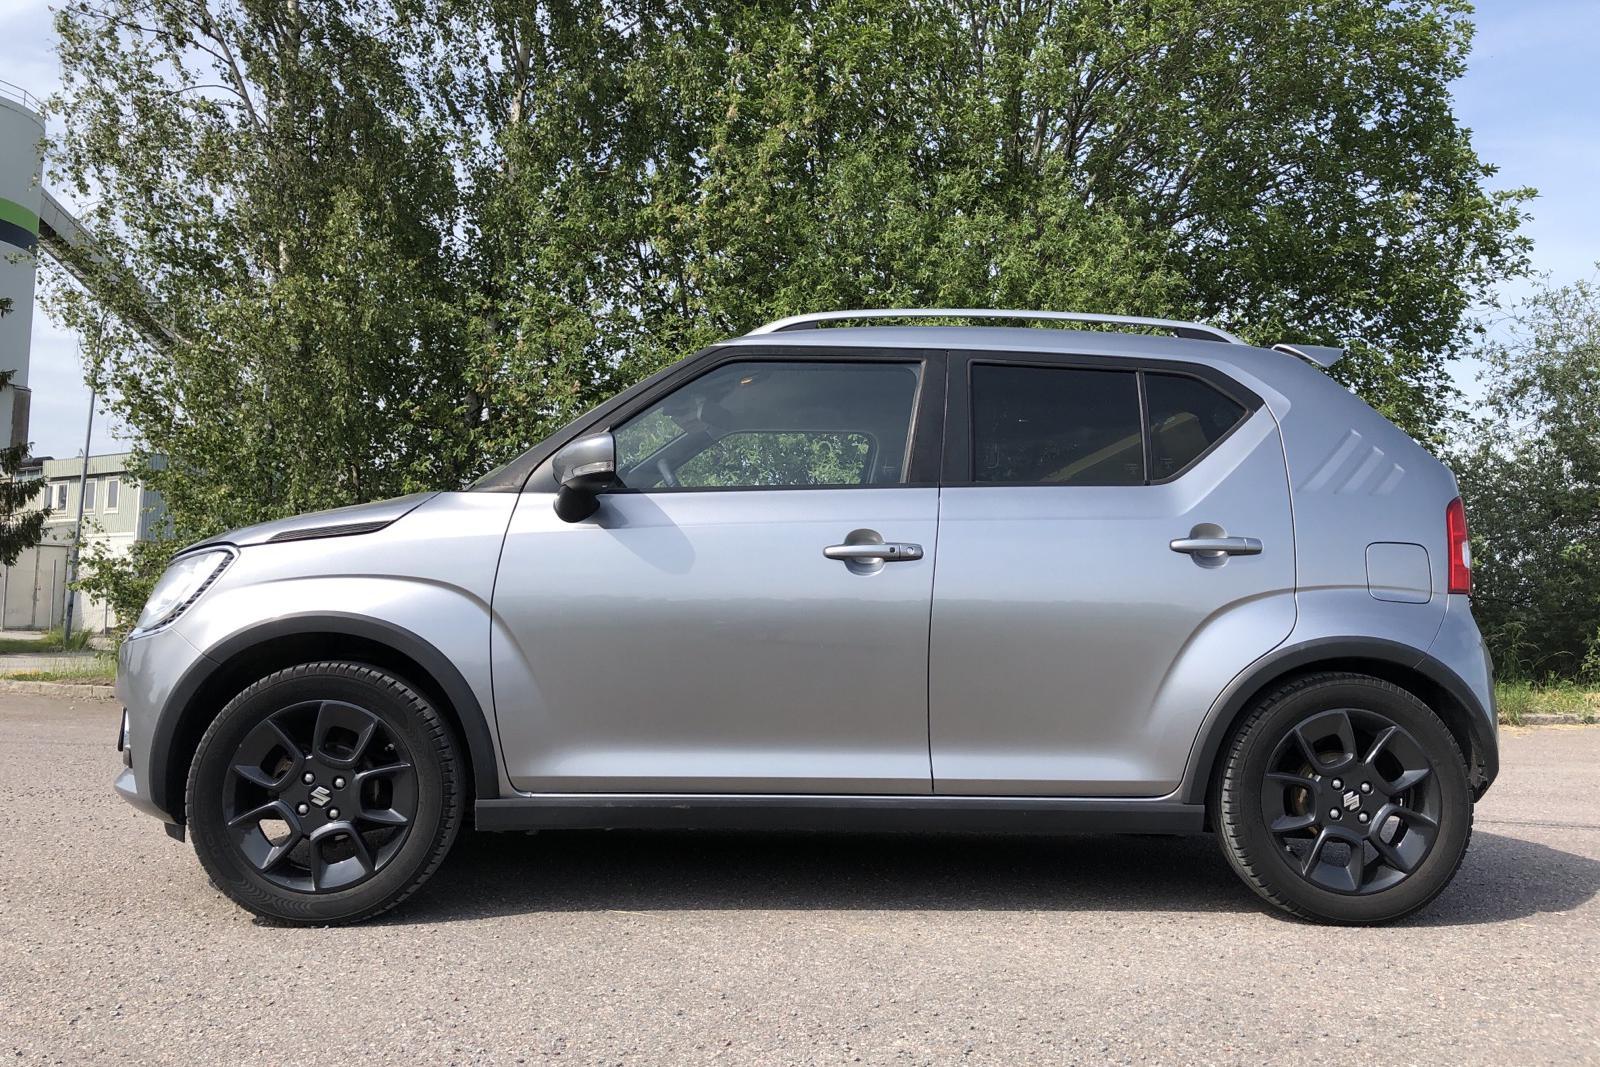 Suzuki Ignis 1.2 SHVS Allgrip 4WD (90hk) - 178 750 km - Manual - silver - 2017